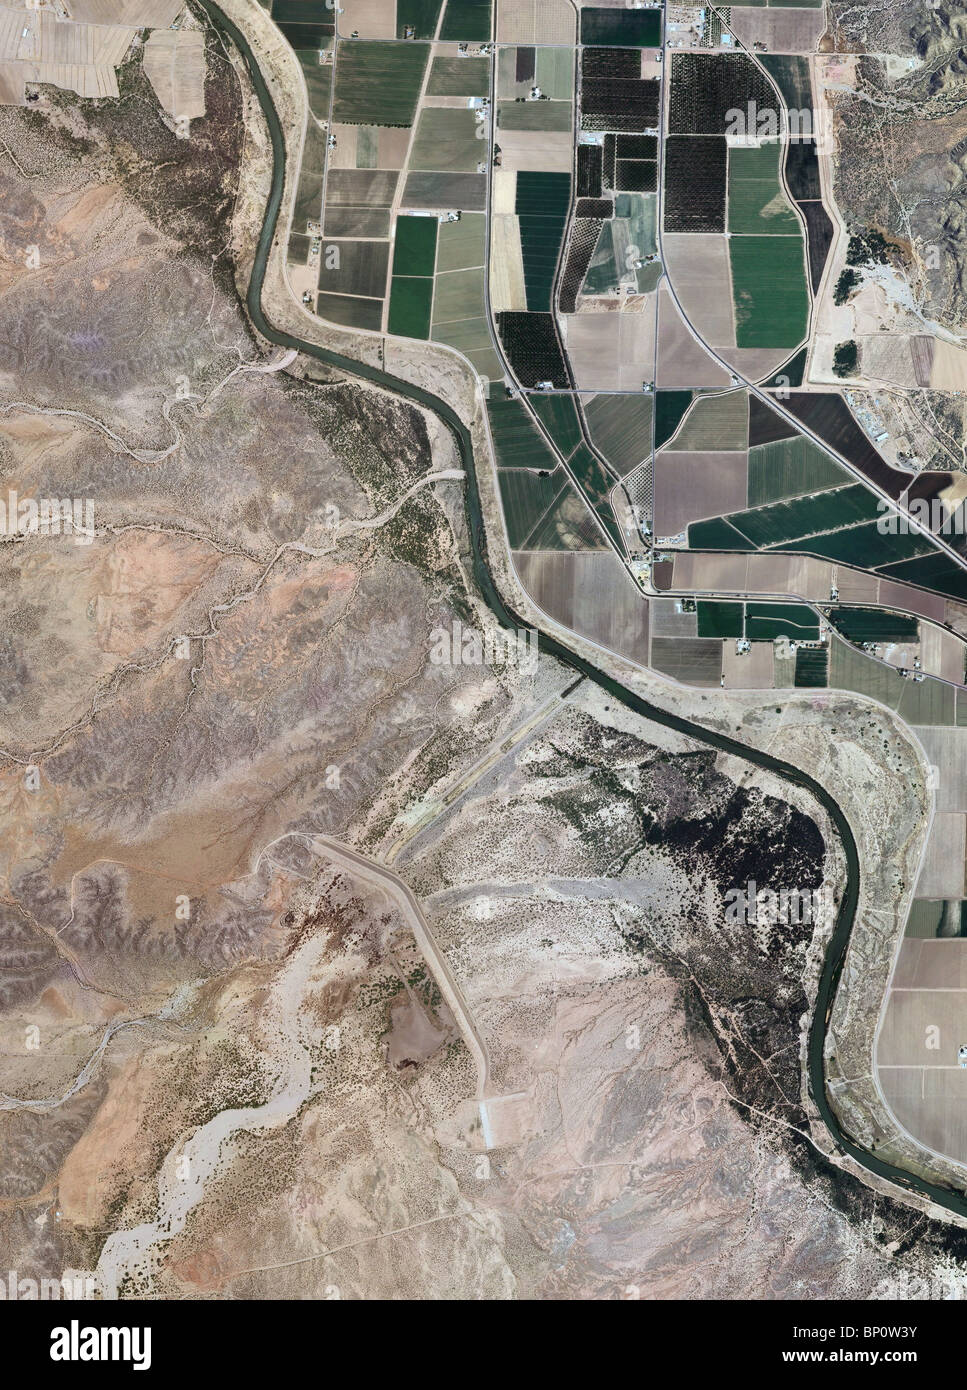 Rio Grande River New Mexico Map.Aerial Map View Above Rio Grande River Valley New Mexico Stock Photo